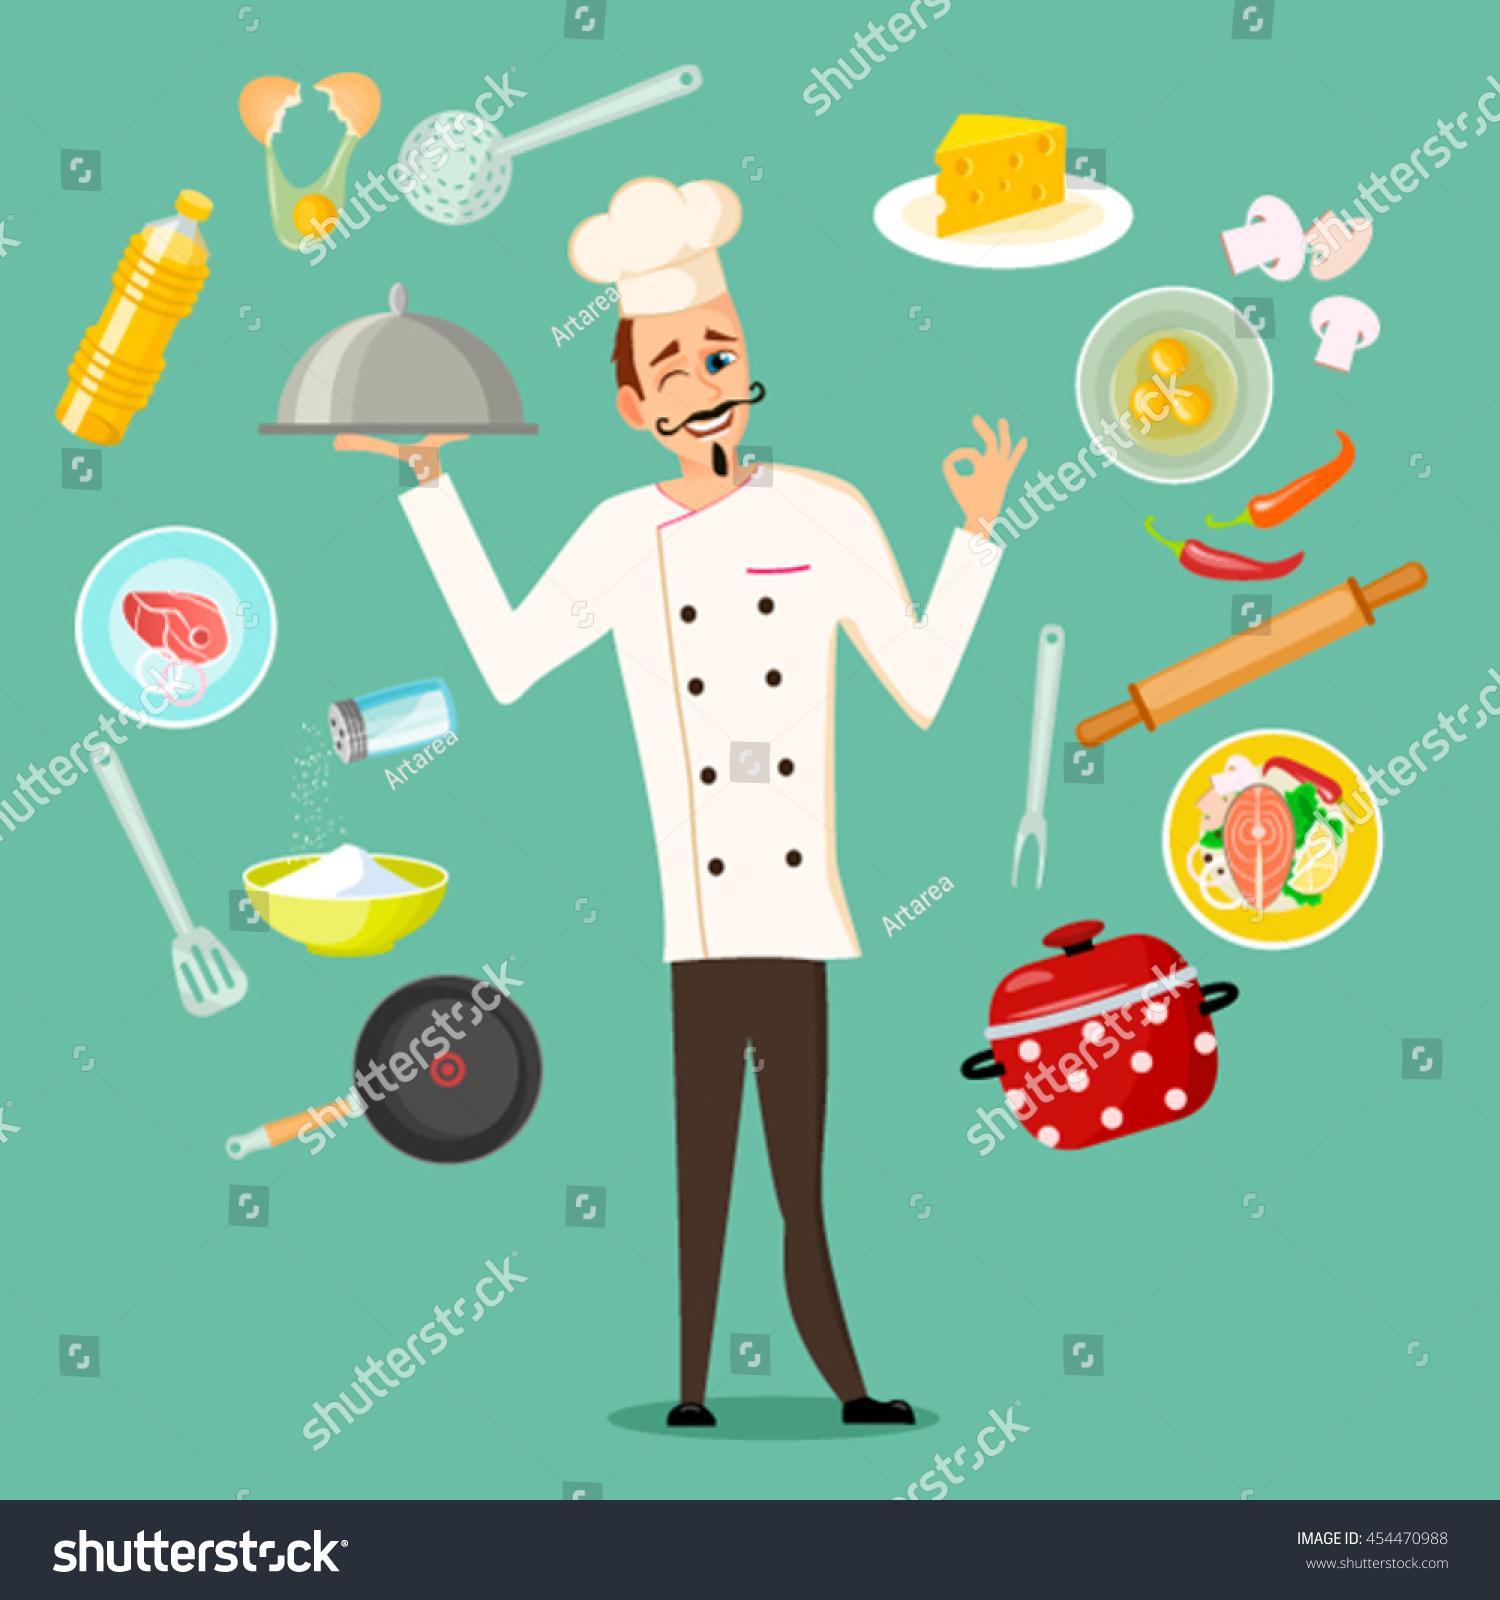 Set Kitchen Utensils Kitchenware Equipment Food Stock Vector ...